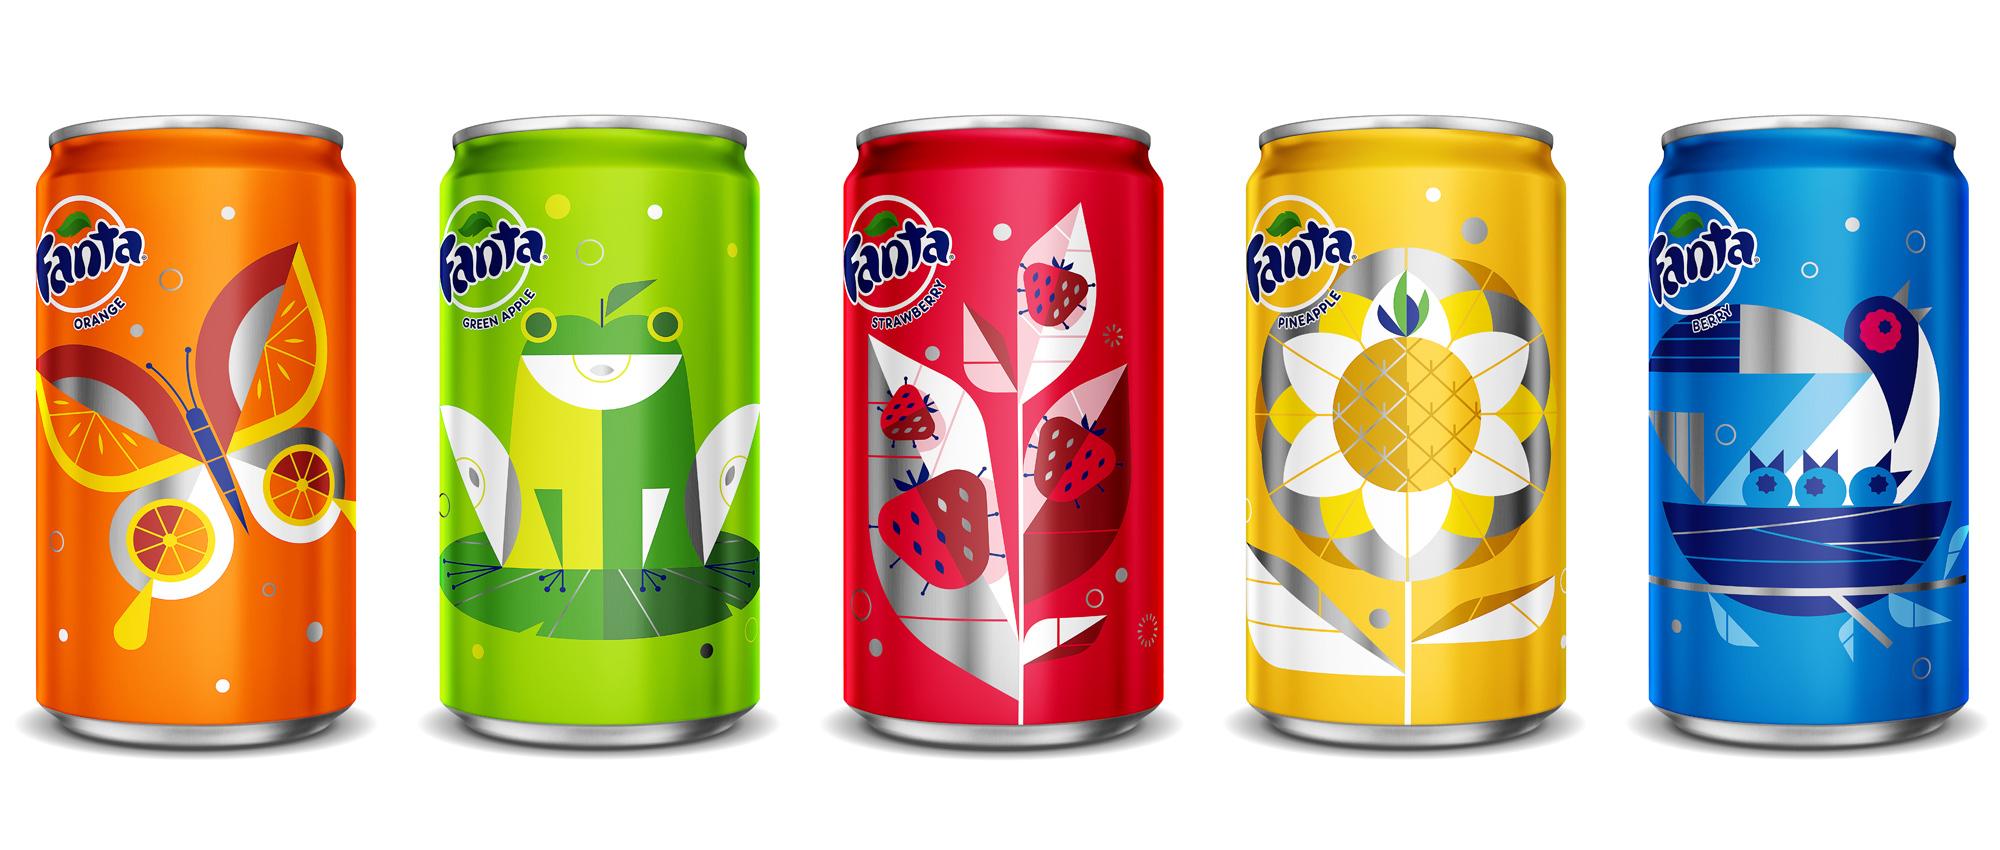 Fanta spring cans 01